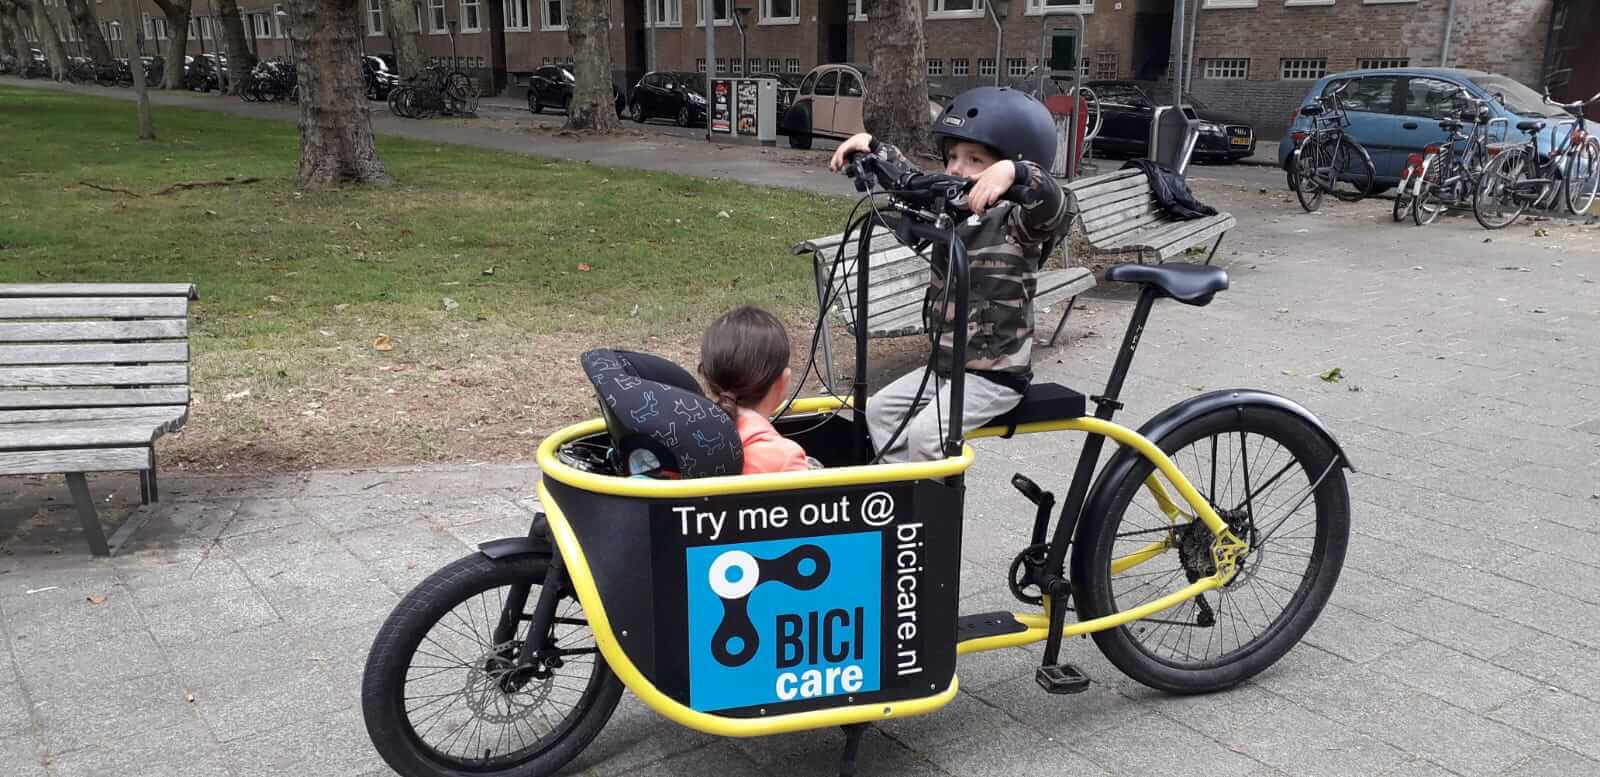 Bakfiets Bogbi Amsterdam